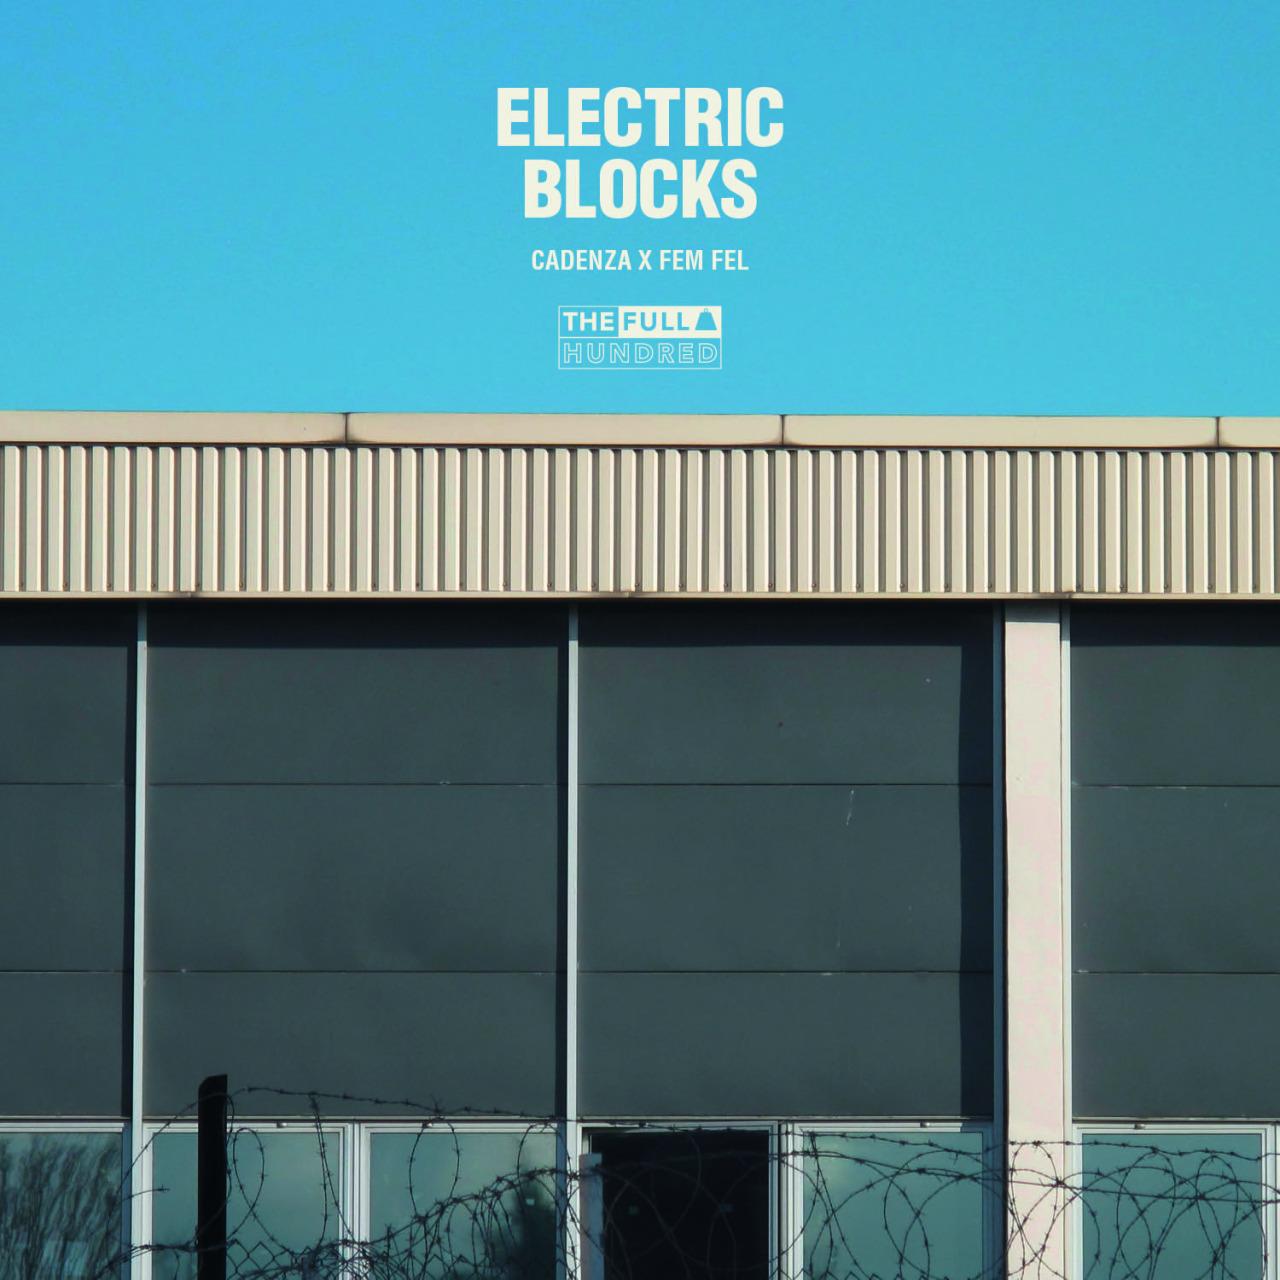 EDM music news, EDM News, EDM news blog, electronic music news, EDM